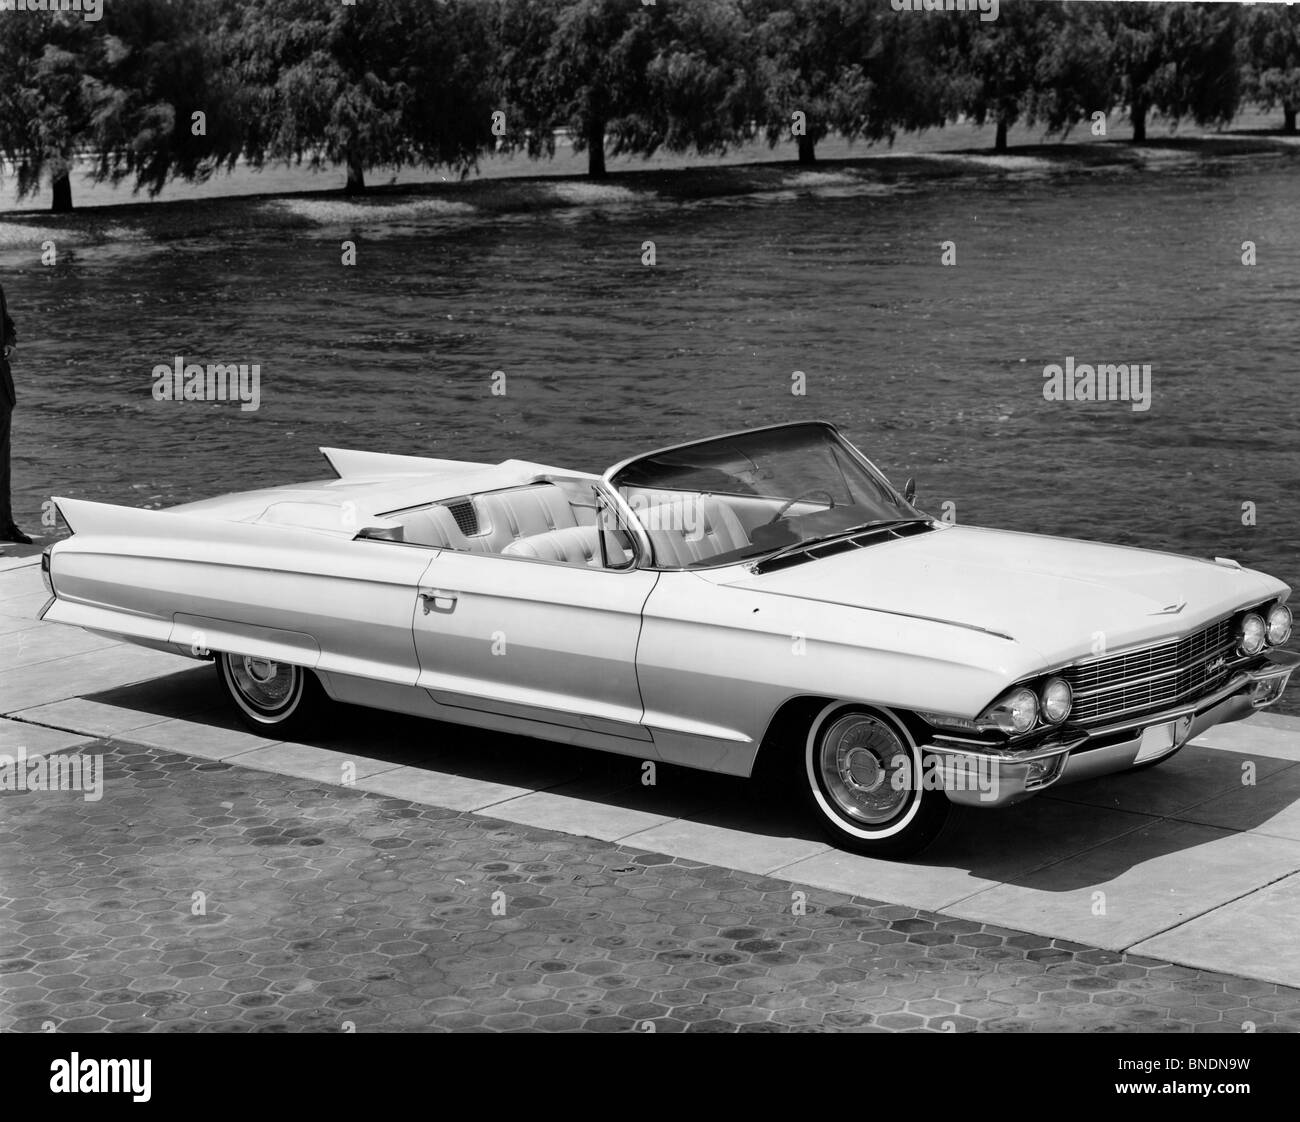 High angle view of a convertible car parked near lake, 1962 Cadillac Series 62 - Stock Image